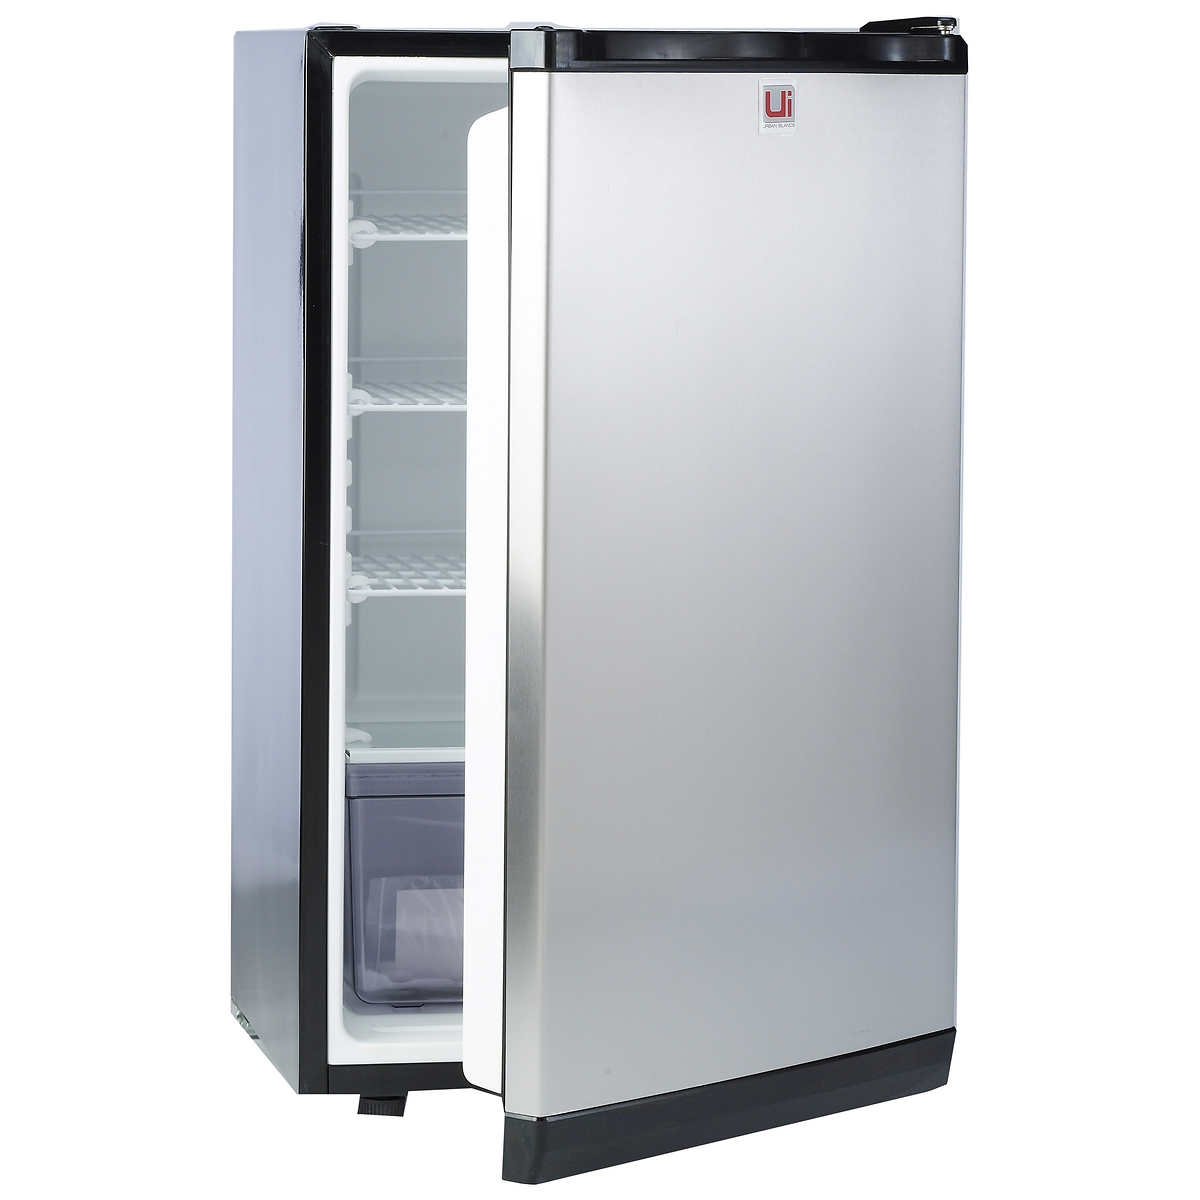 Stainless Steel Refridgerators Urban Islands 45 Cu Ft Stainless Steel Refrigerator By Bull